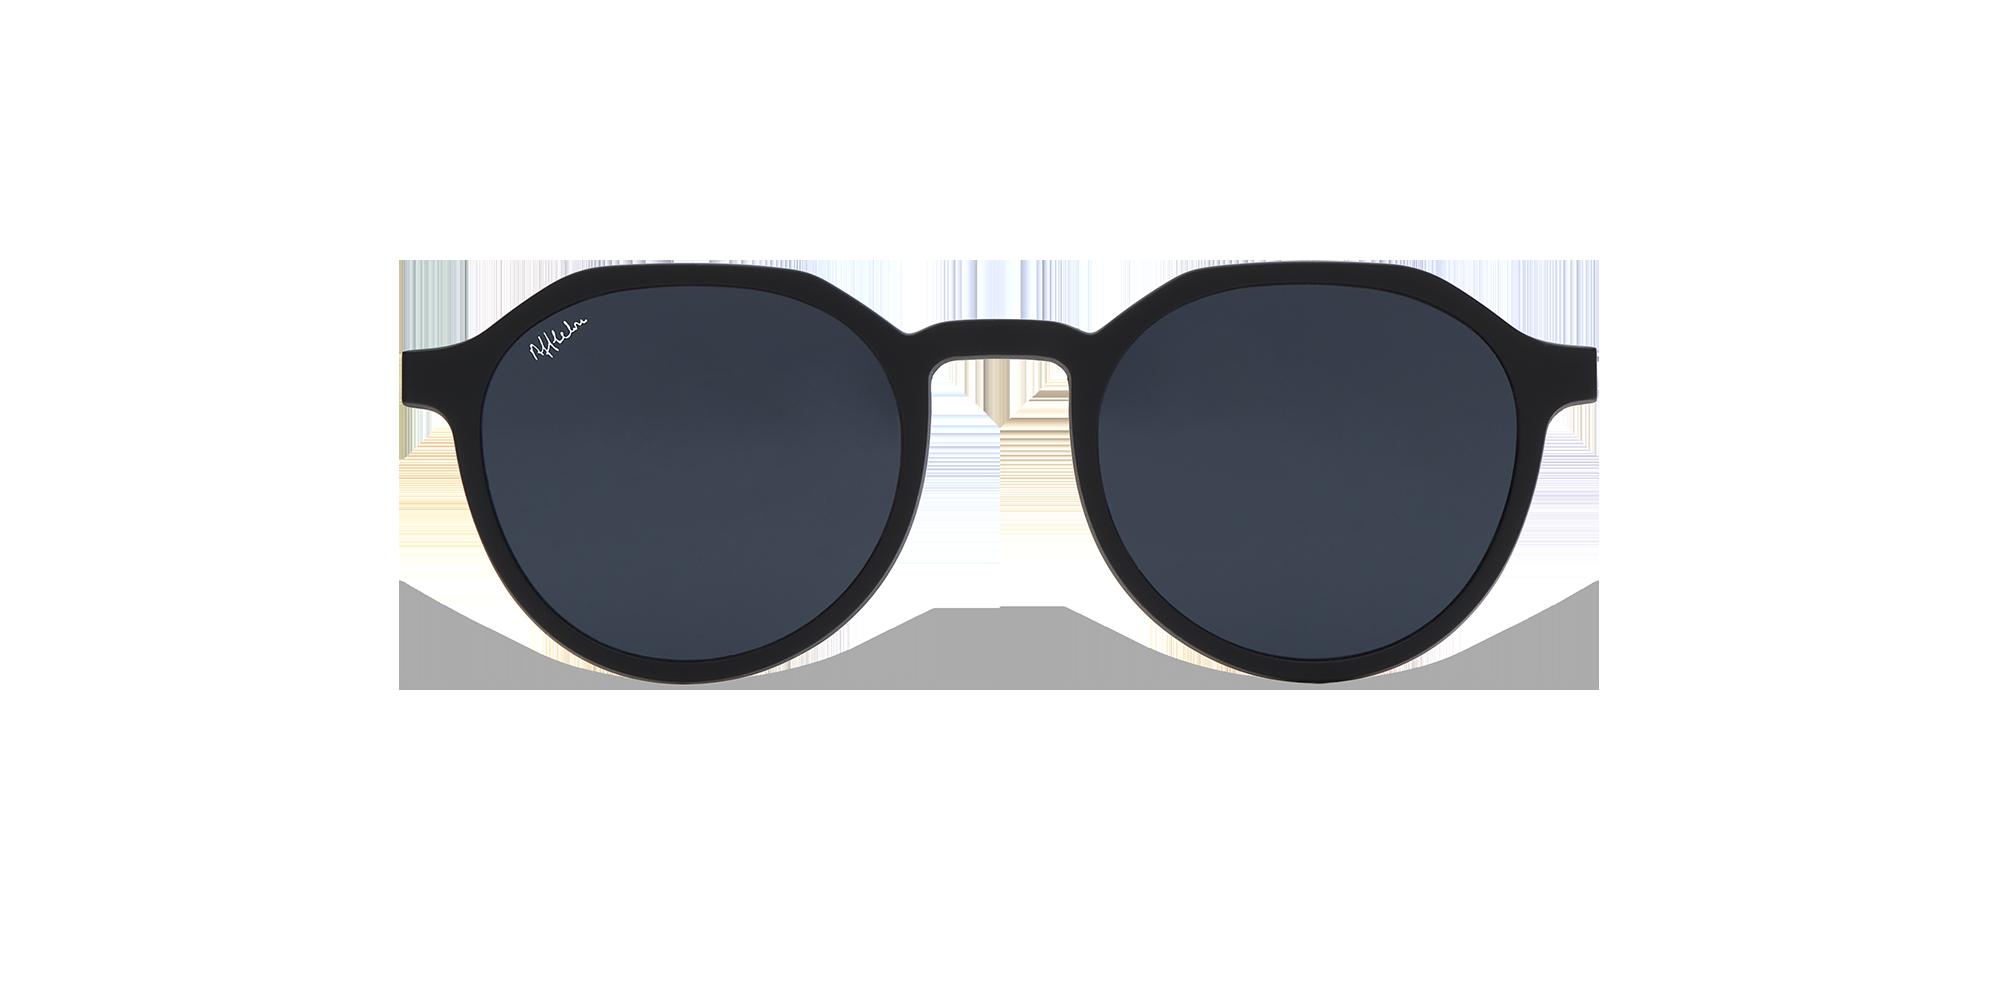 afflelou/france/products/smart_clip/clips_glasses/07630036429068_face.png